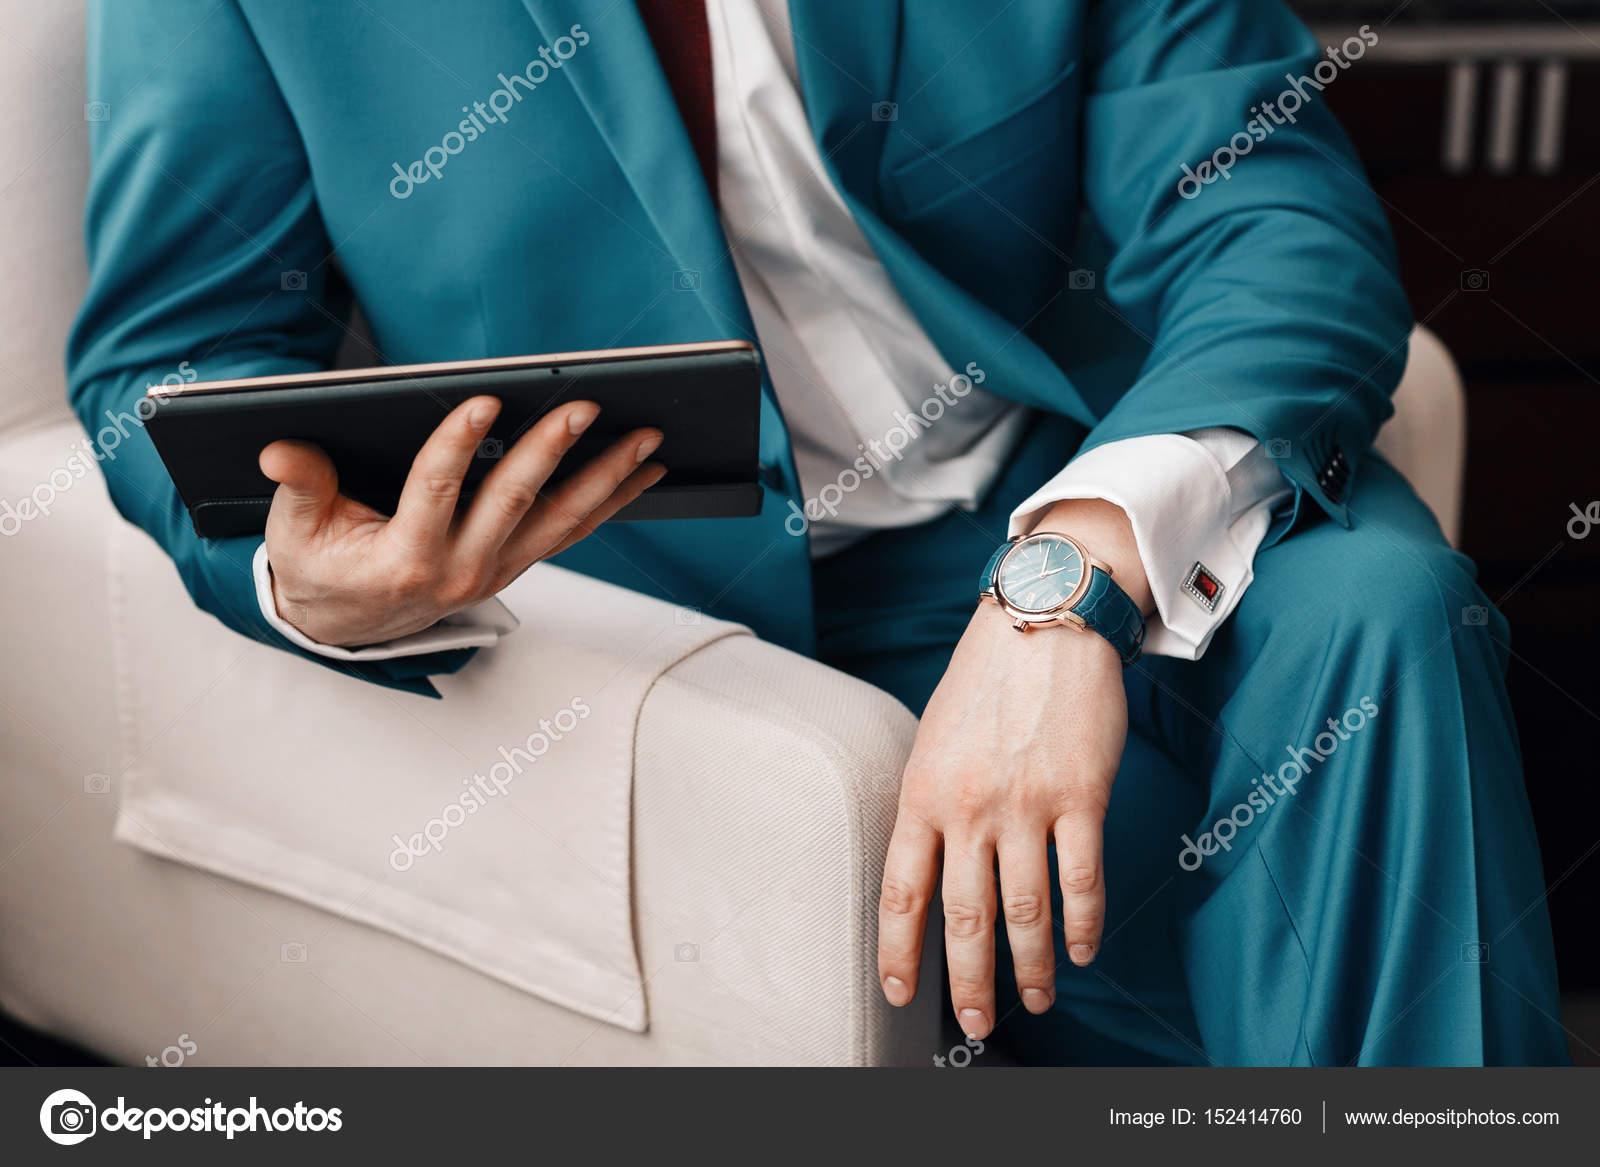 f2eec9731754 ... ενώ κάθεται σε έναν καναπέ σε ένα μπλε κοστούμι. στο χέρι ακριβά  μηχανικό ρολόι με δερμάτινο λουράκι. Πουκαμίσα με μανικετόκουμπα — Εικόνα  από ...